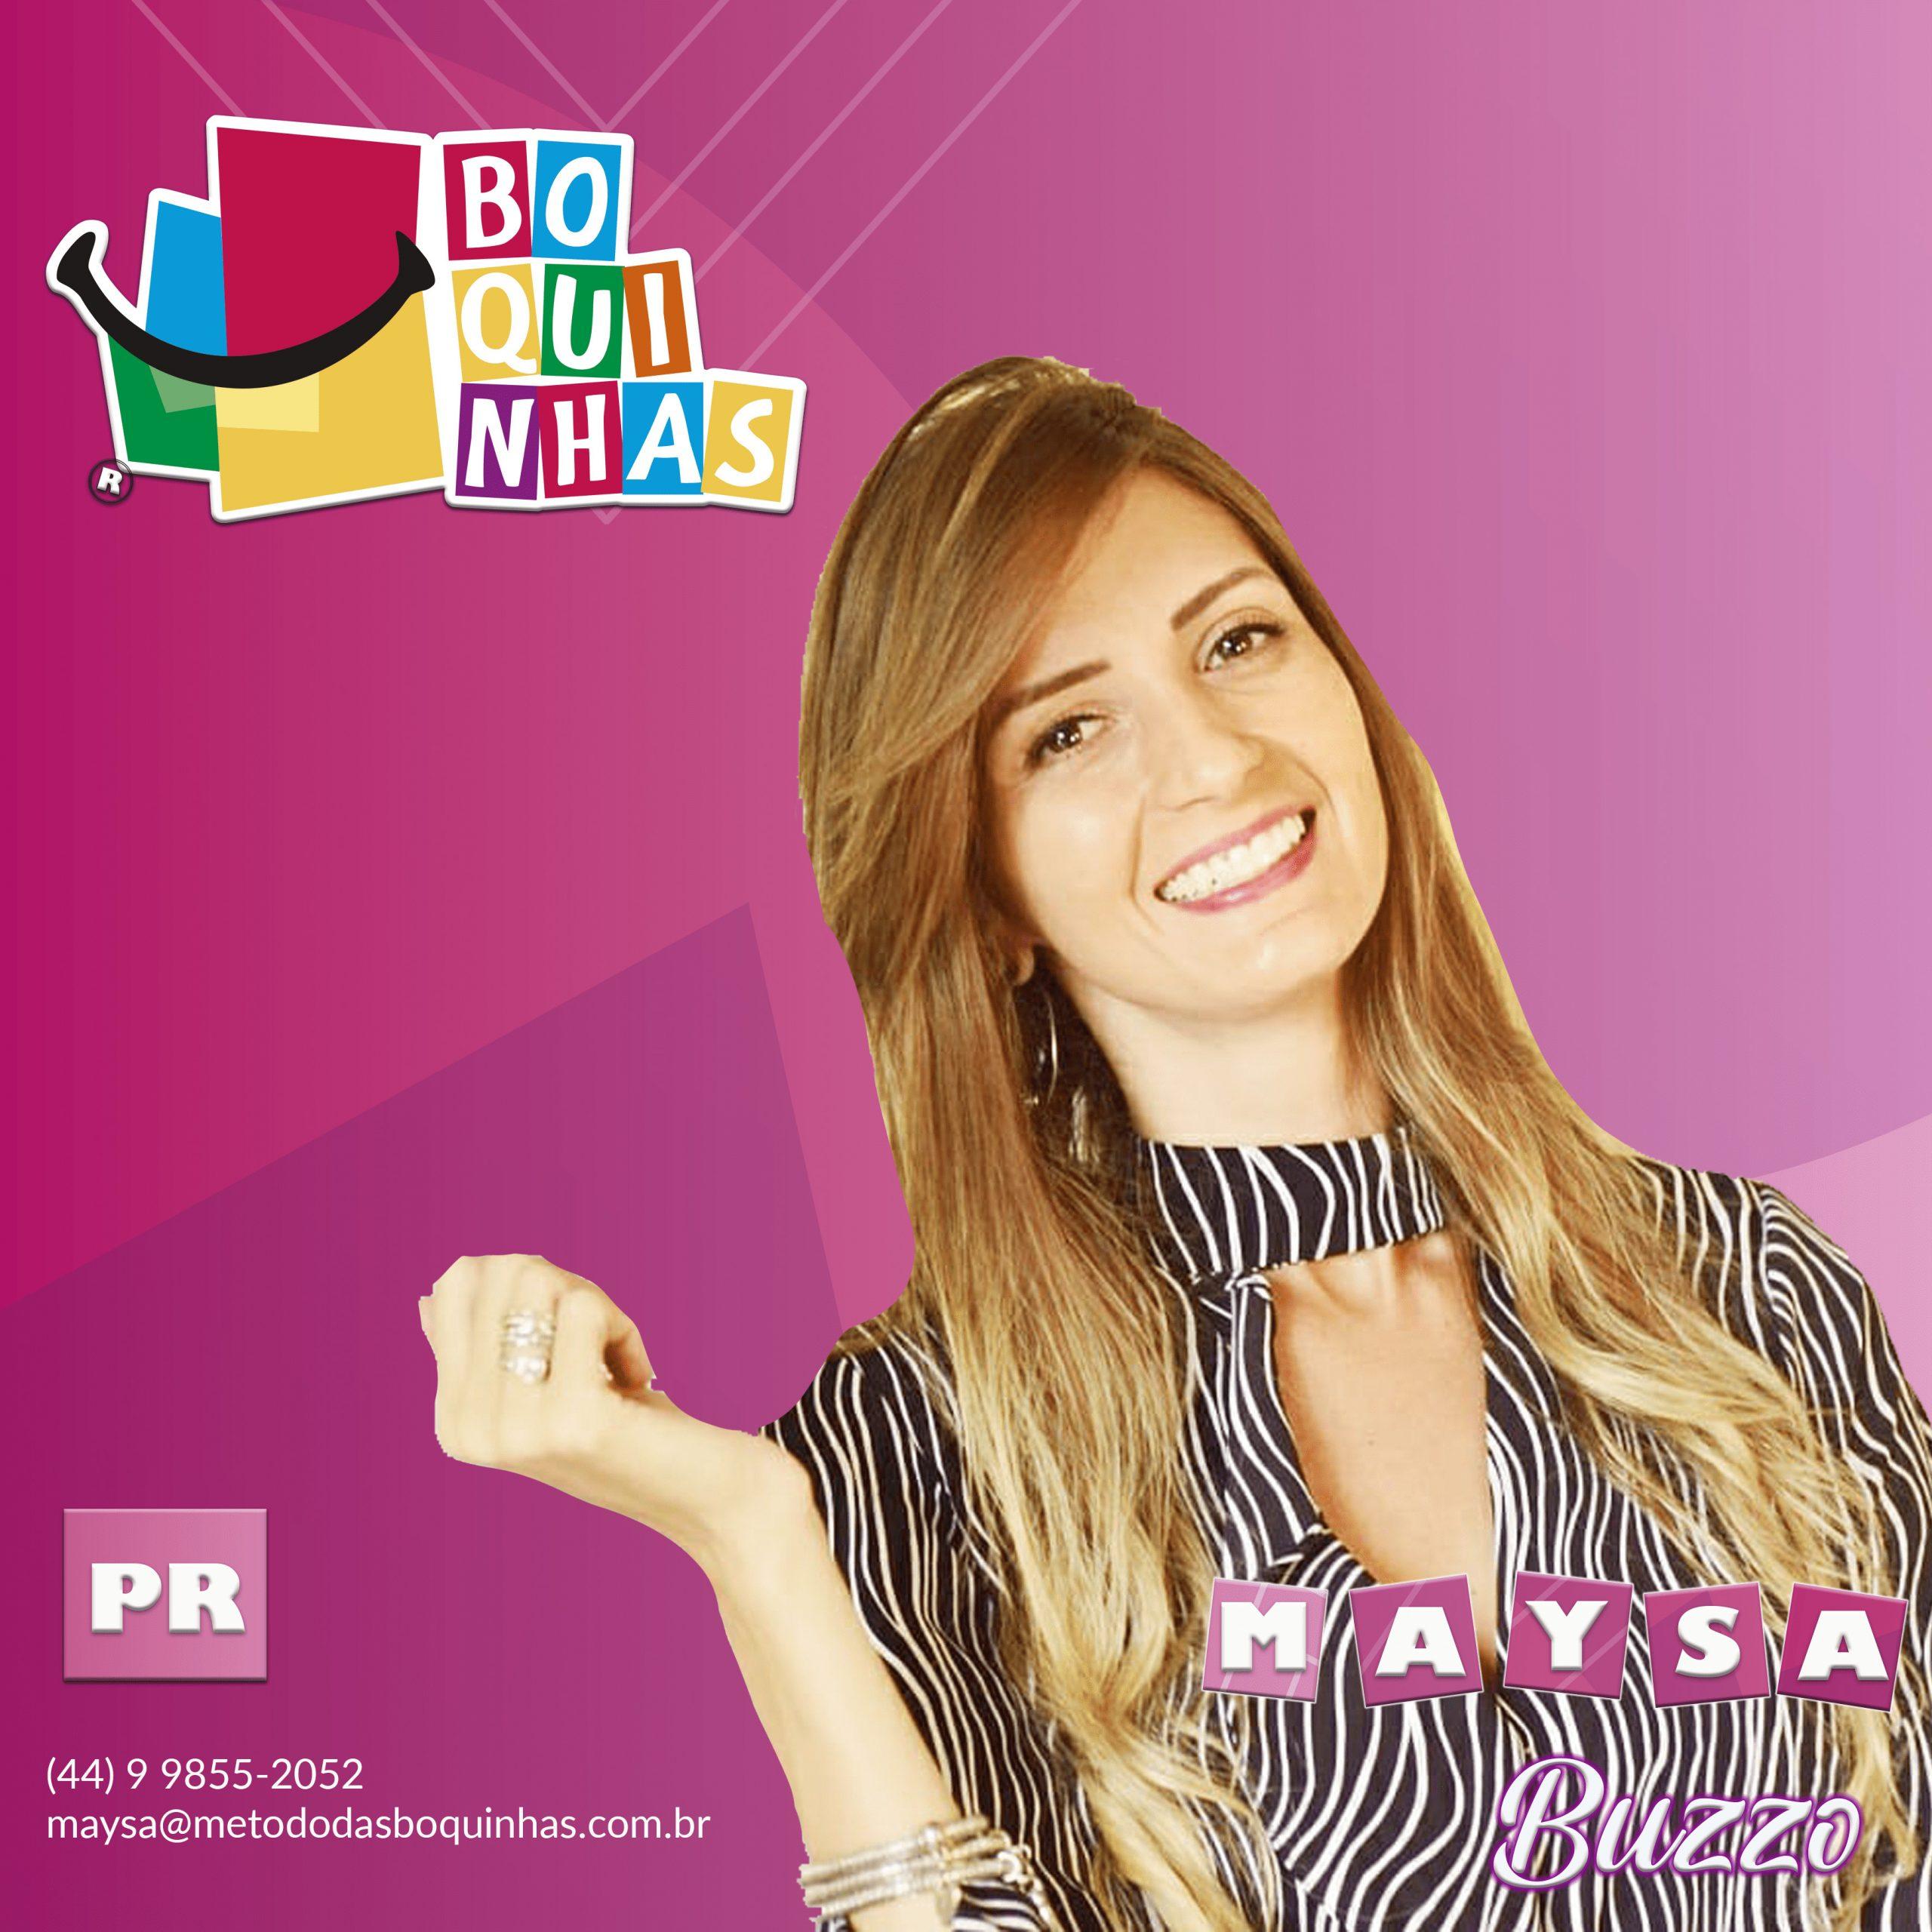 MAYSA GABRIELA BUZZO BLANCO